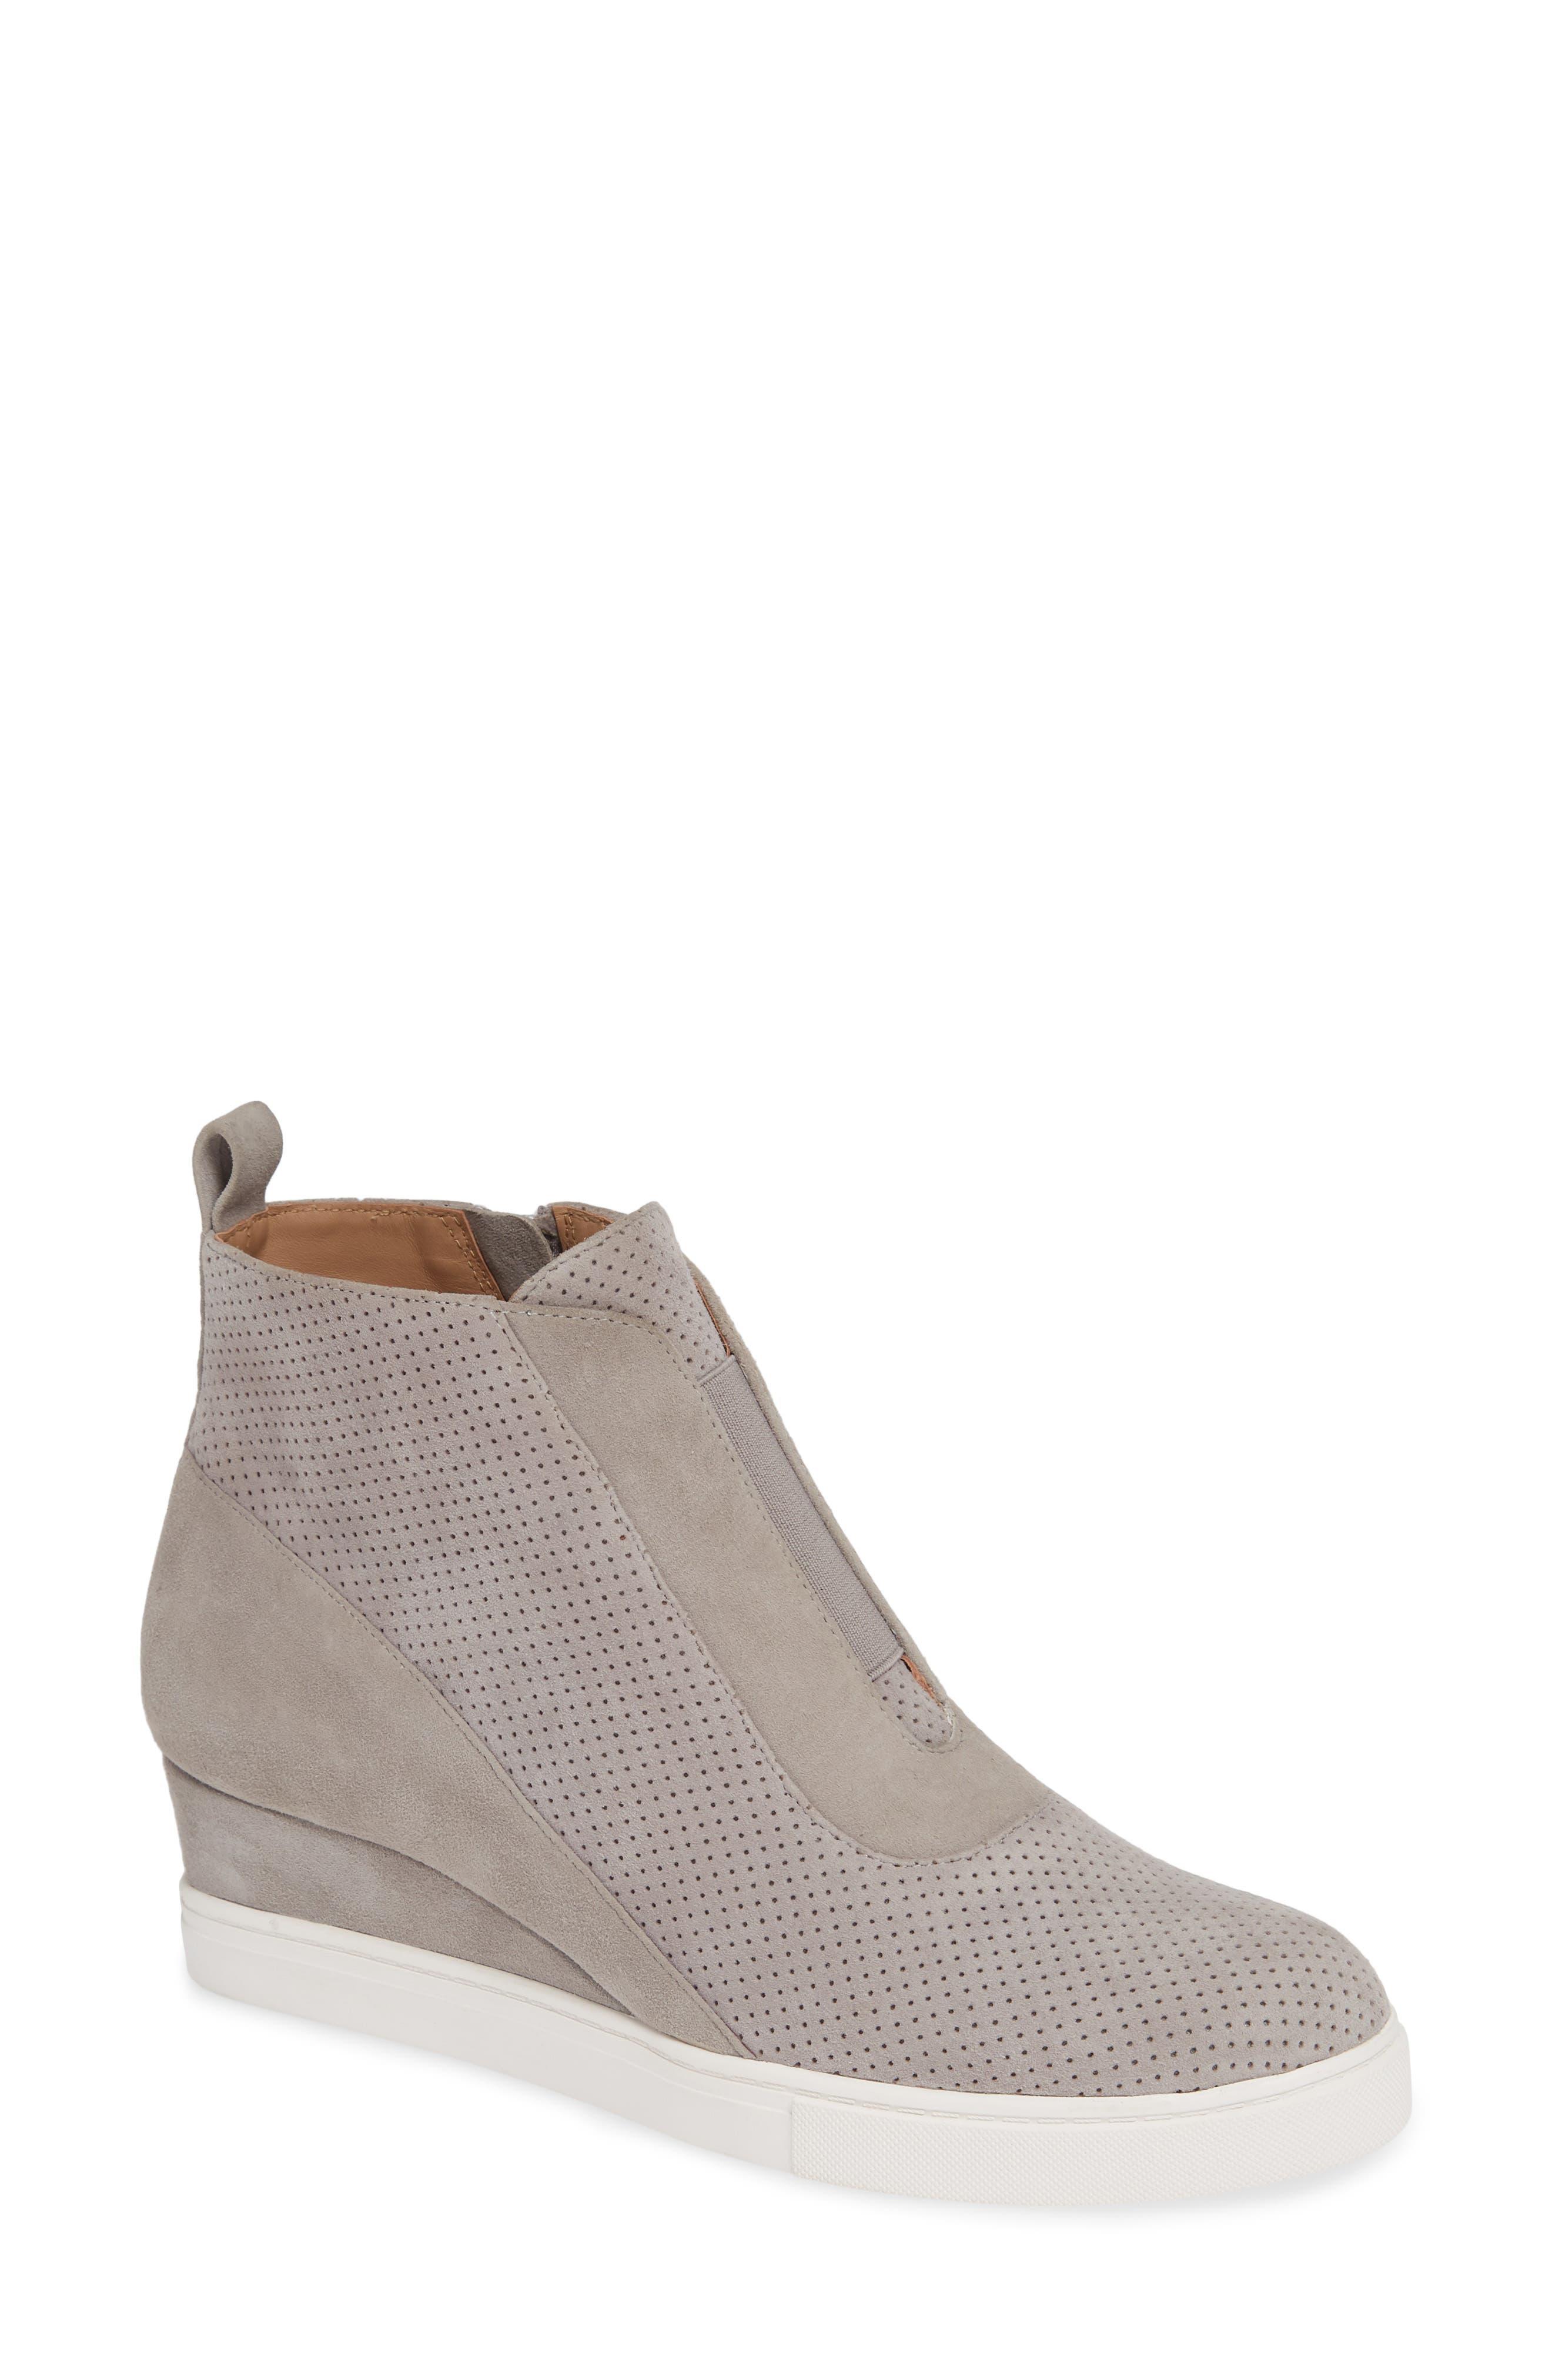 LINEA PAOLO Anna Wedge Sneaker, Main, color, ROCK PER SUEDE